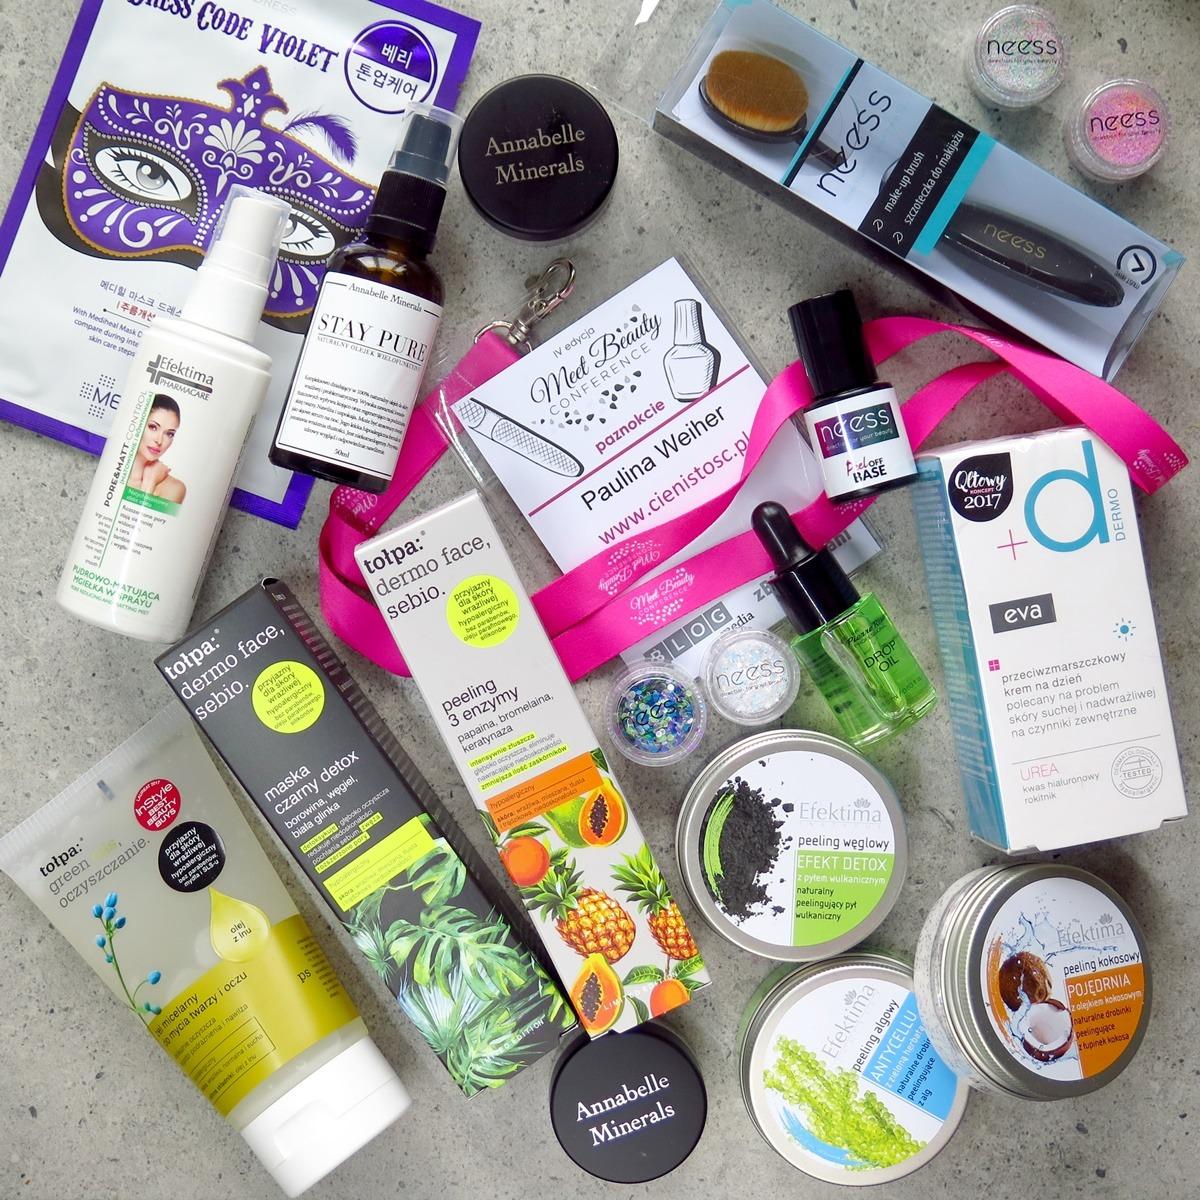 Kosmetyki blogerki urodowej meet beauty konferencja - tołpa, efektima, pollena eva dermo, neess, annabelle minerals, mediheal